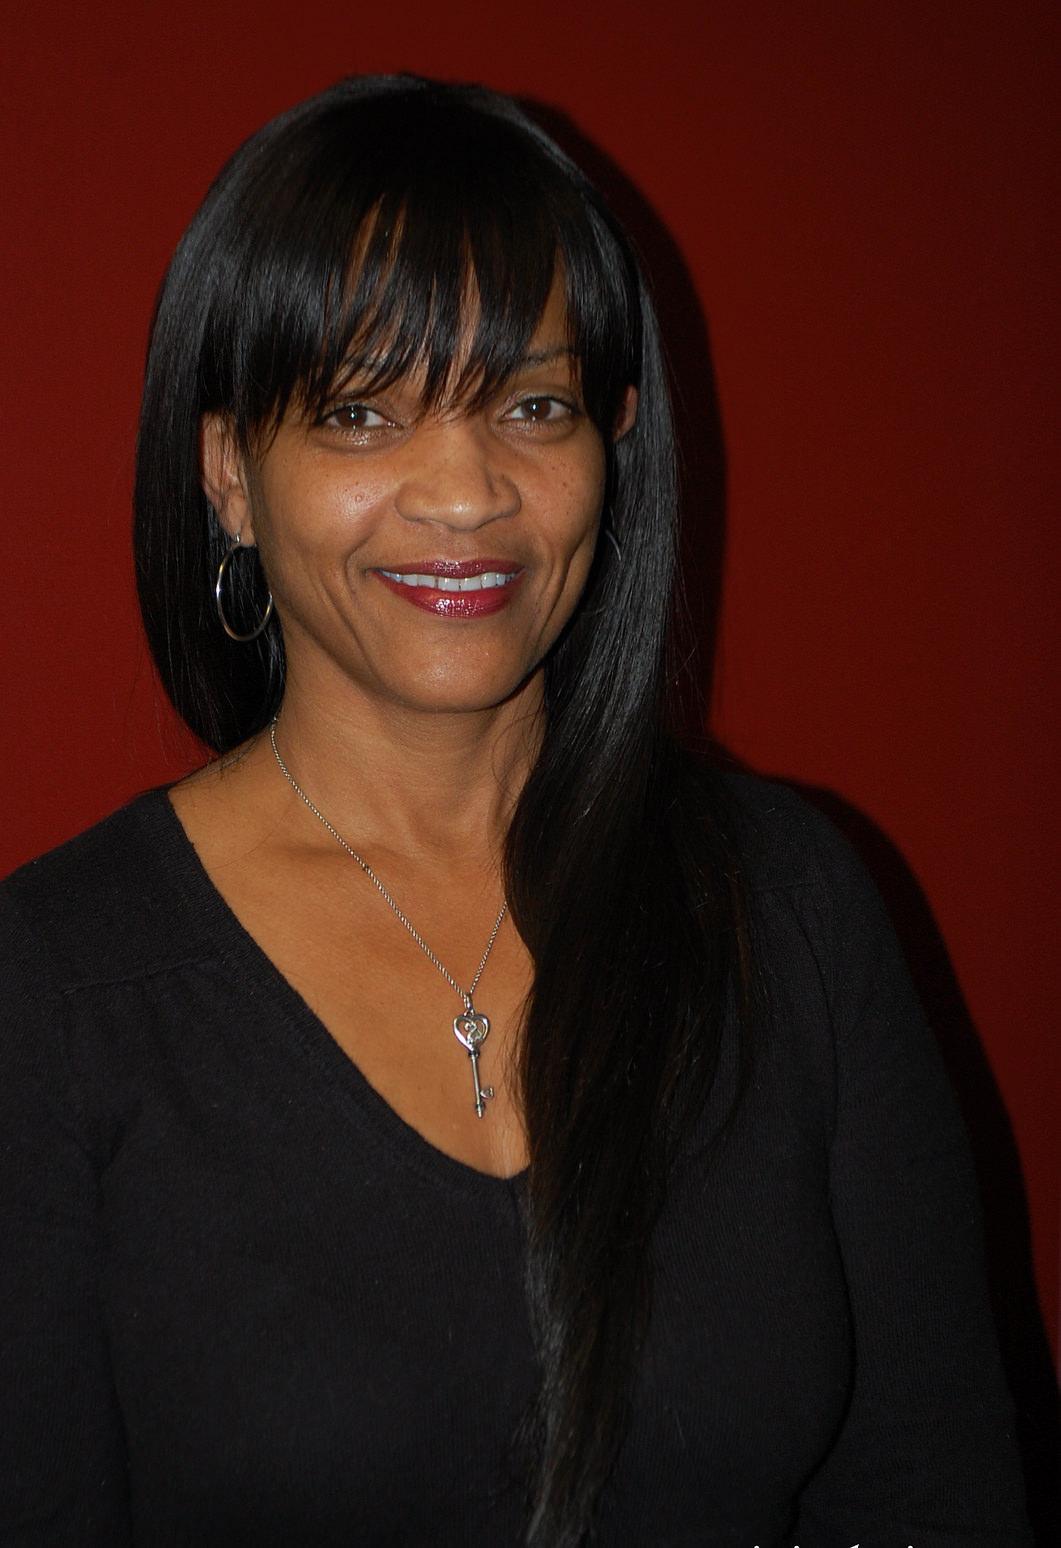 Pleasant 21 Black Weave Haircut Designs Ideas Hairstyles Design Trends Short Hairstyles For Black Women Fulllsitofus